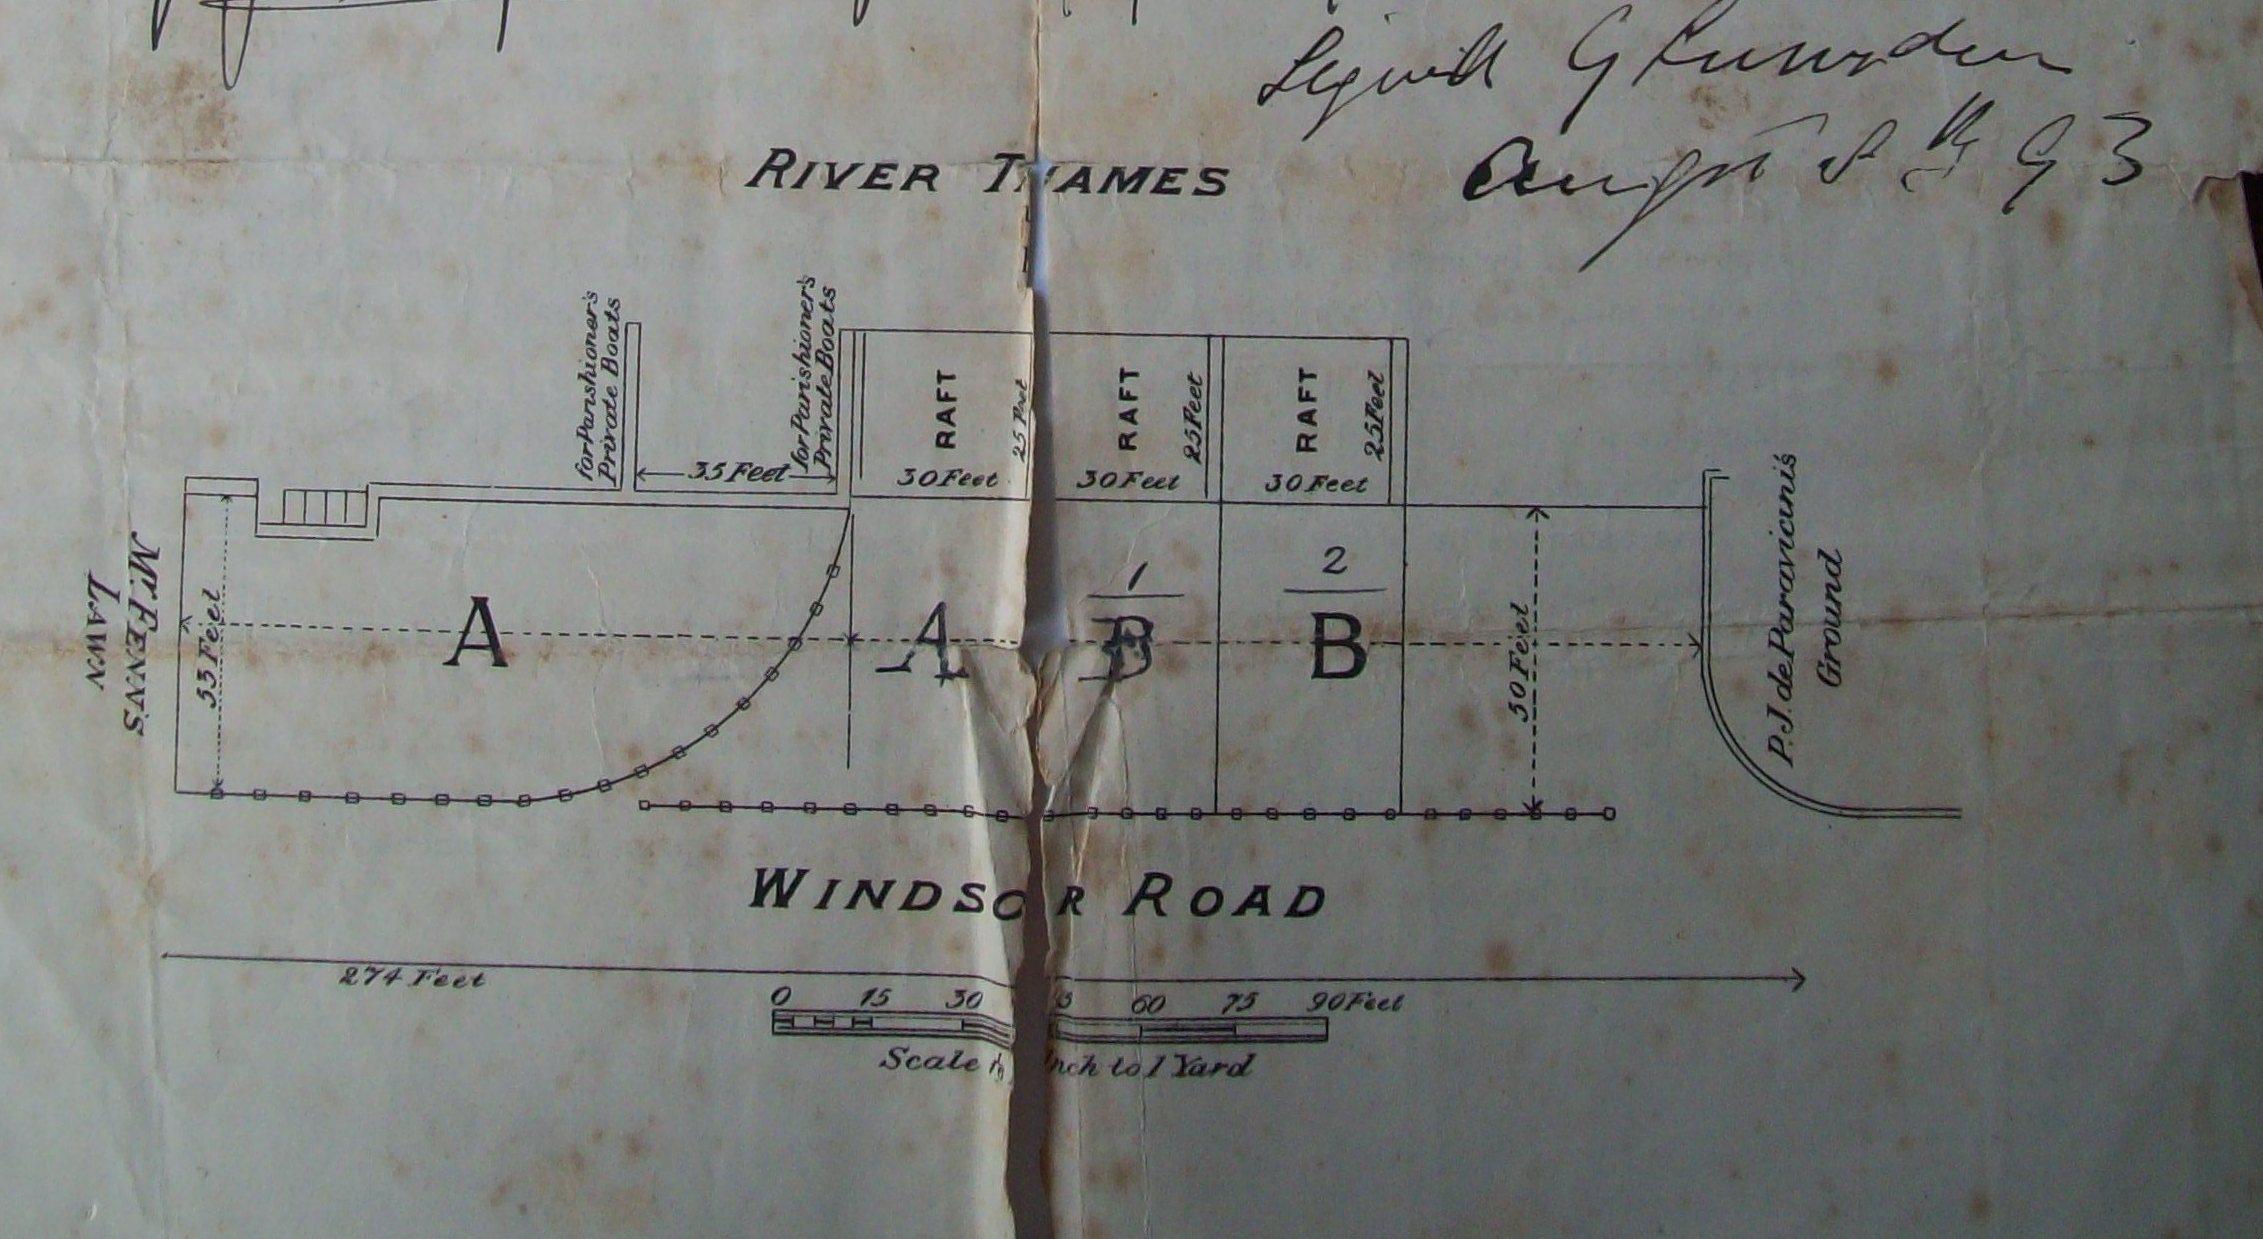 1893 doc 2 - Copy